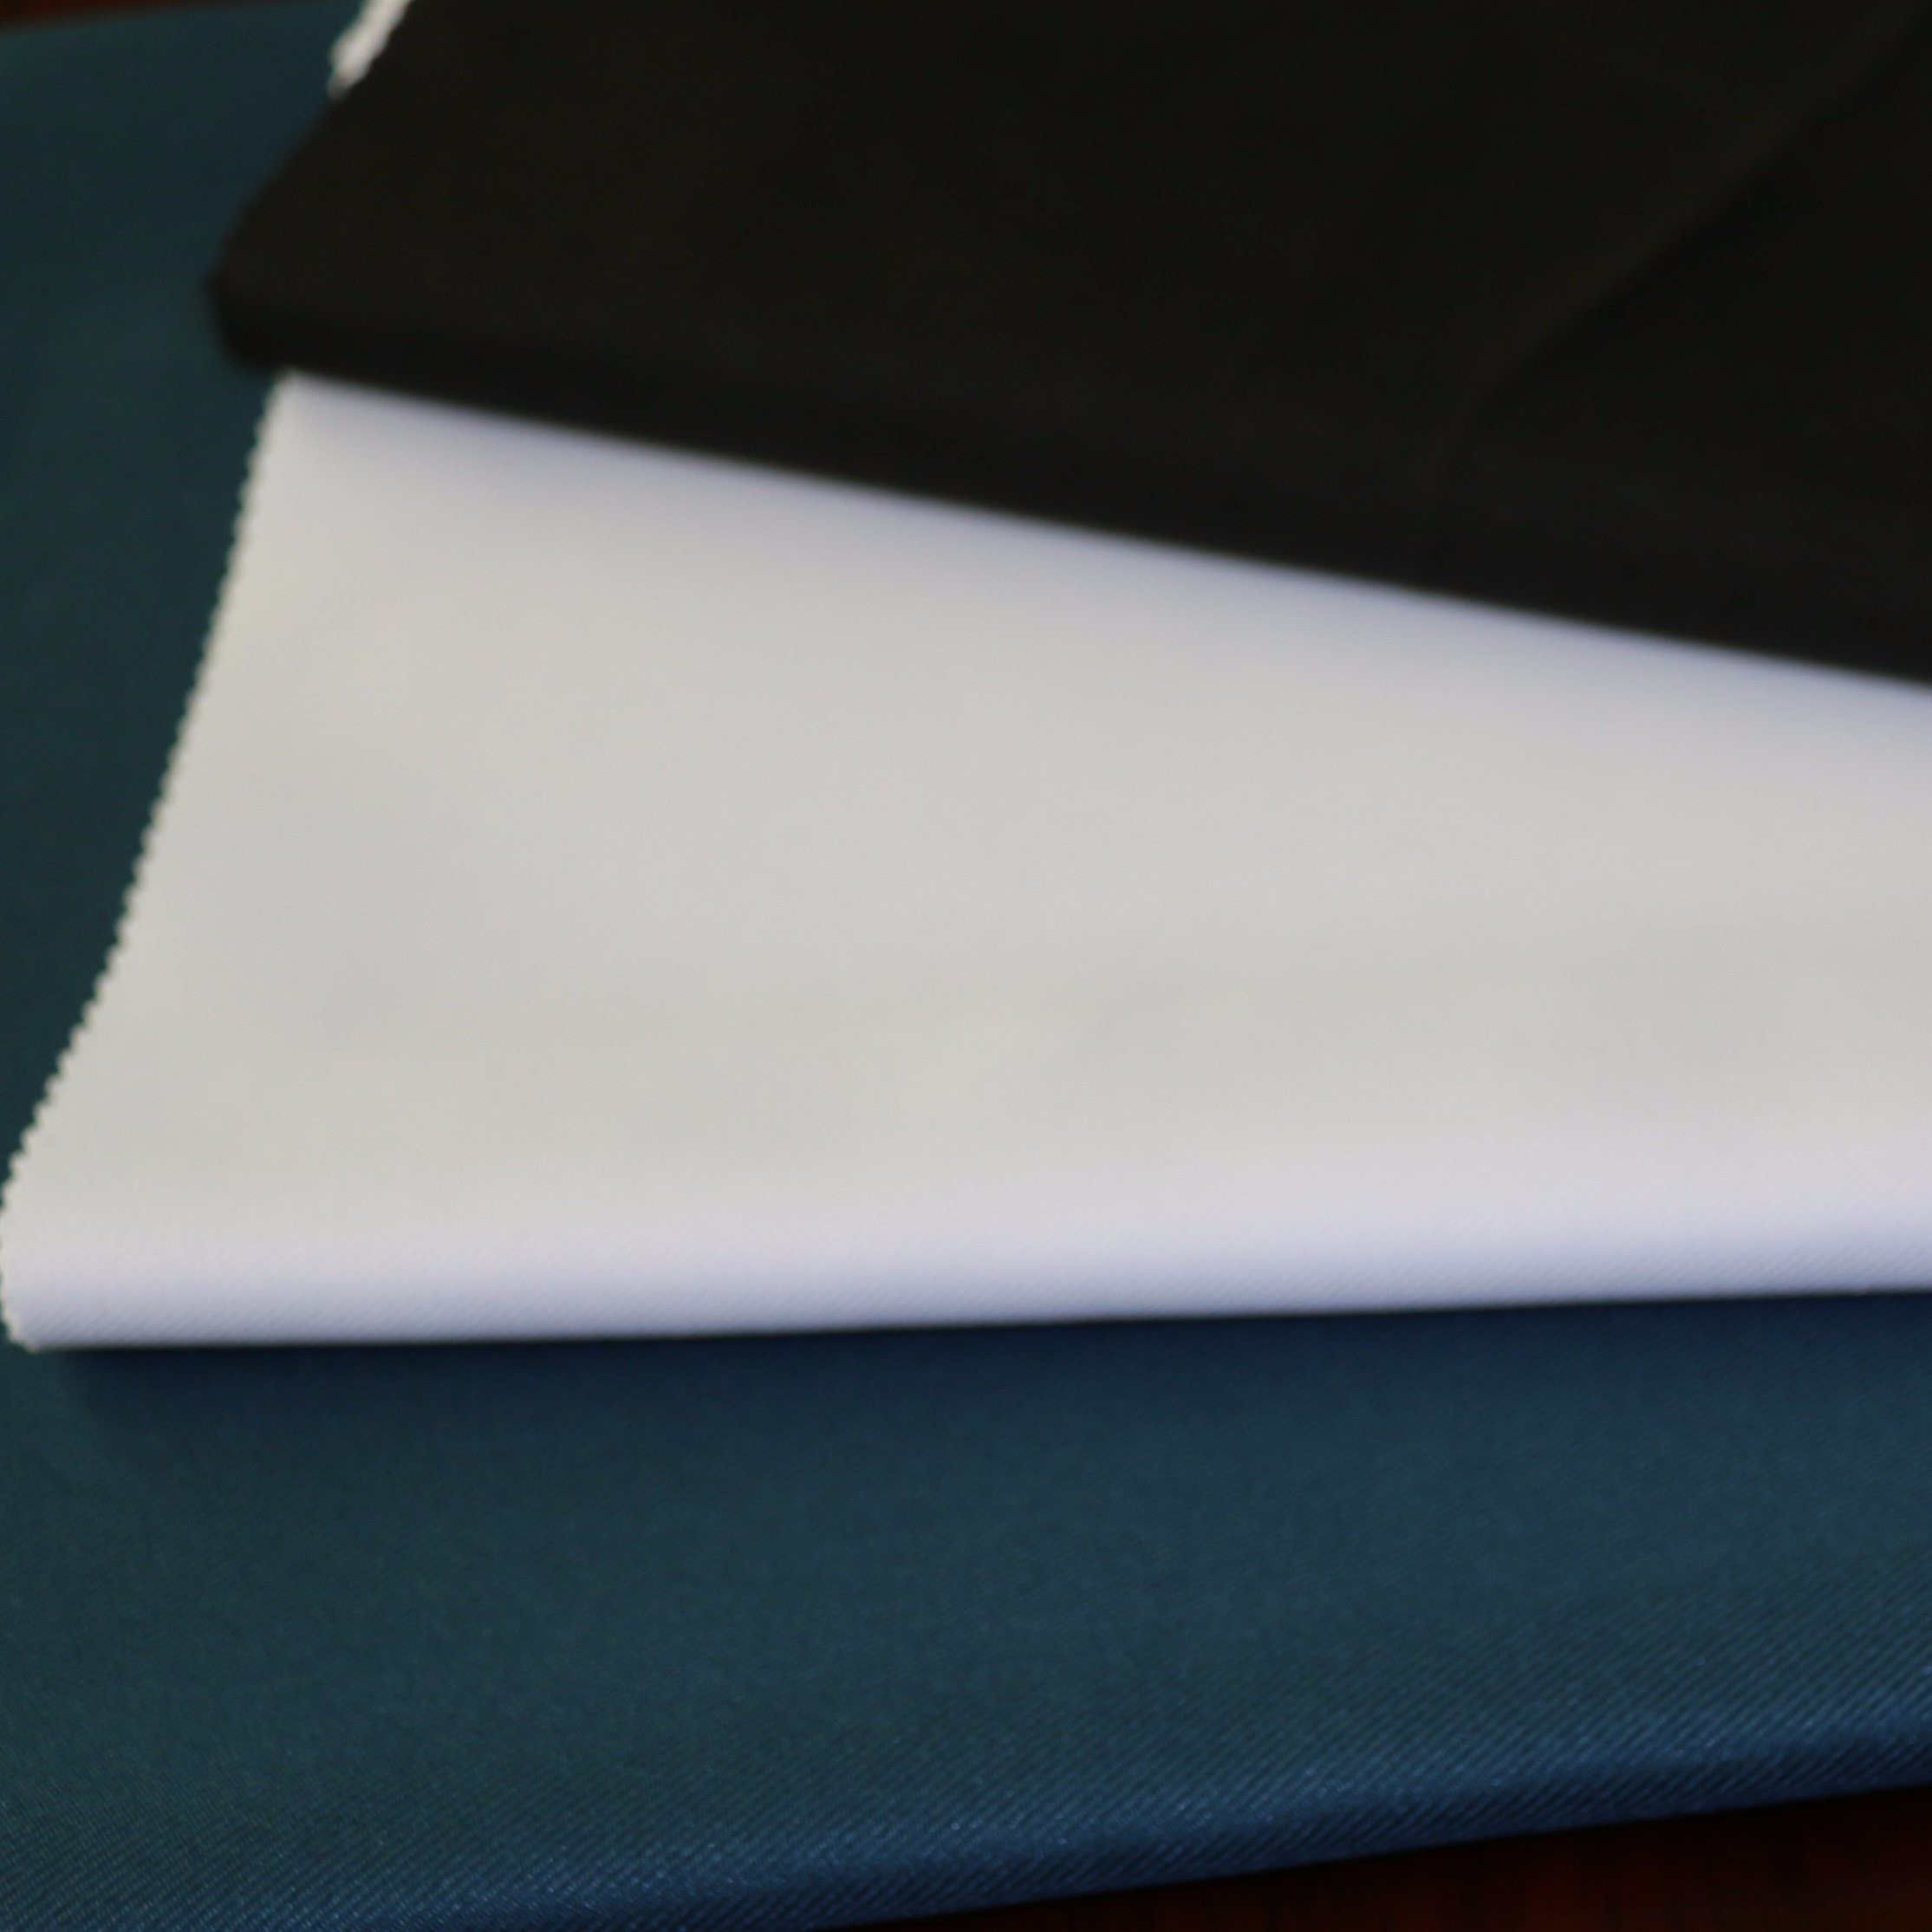 300d Gaberdine 2/2 Twill Polyester Fabric